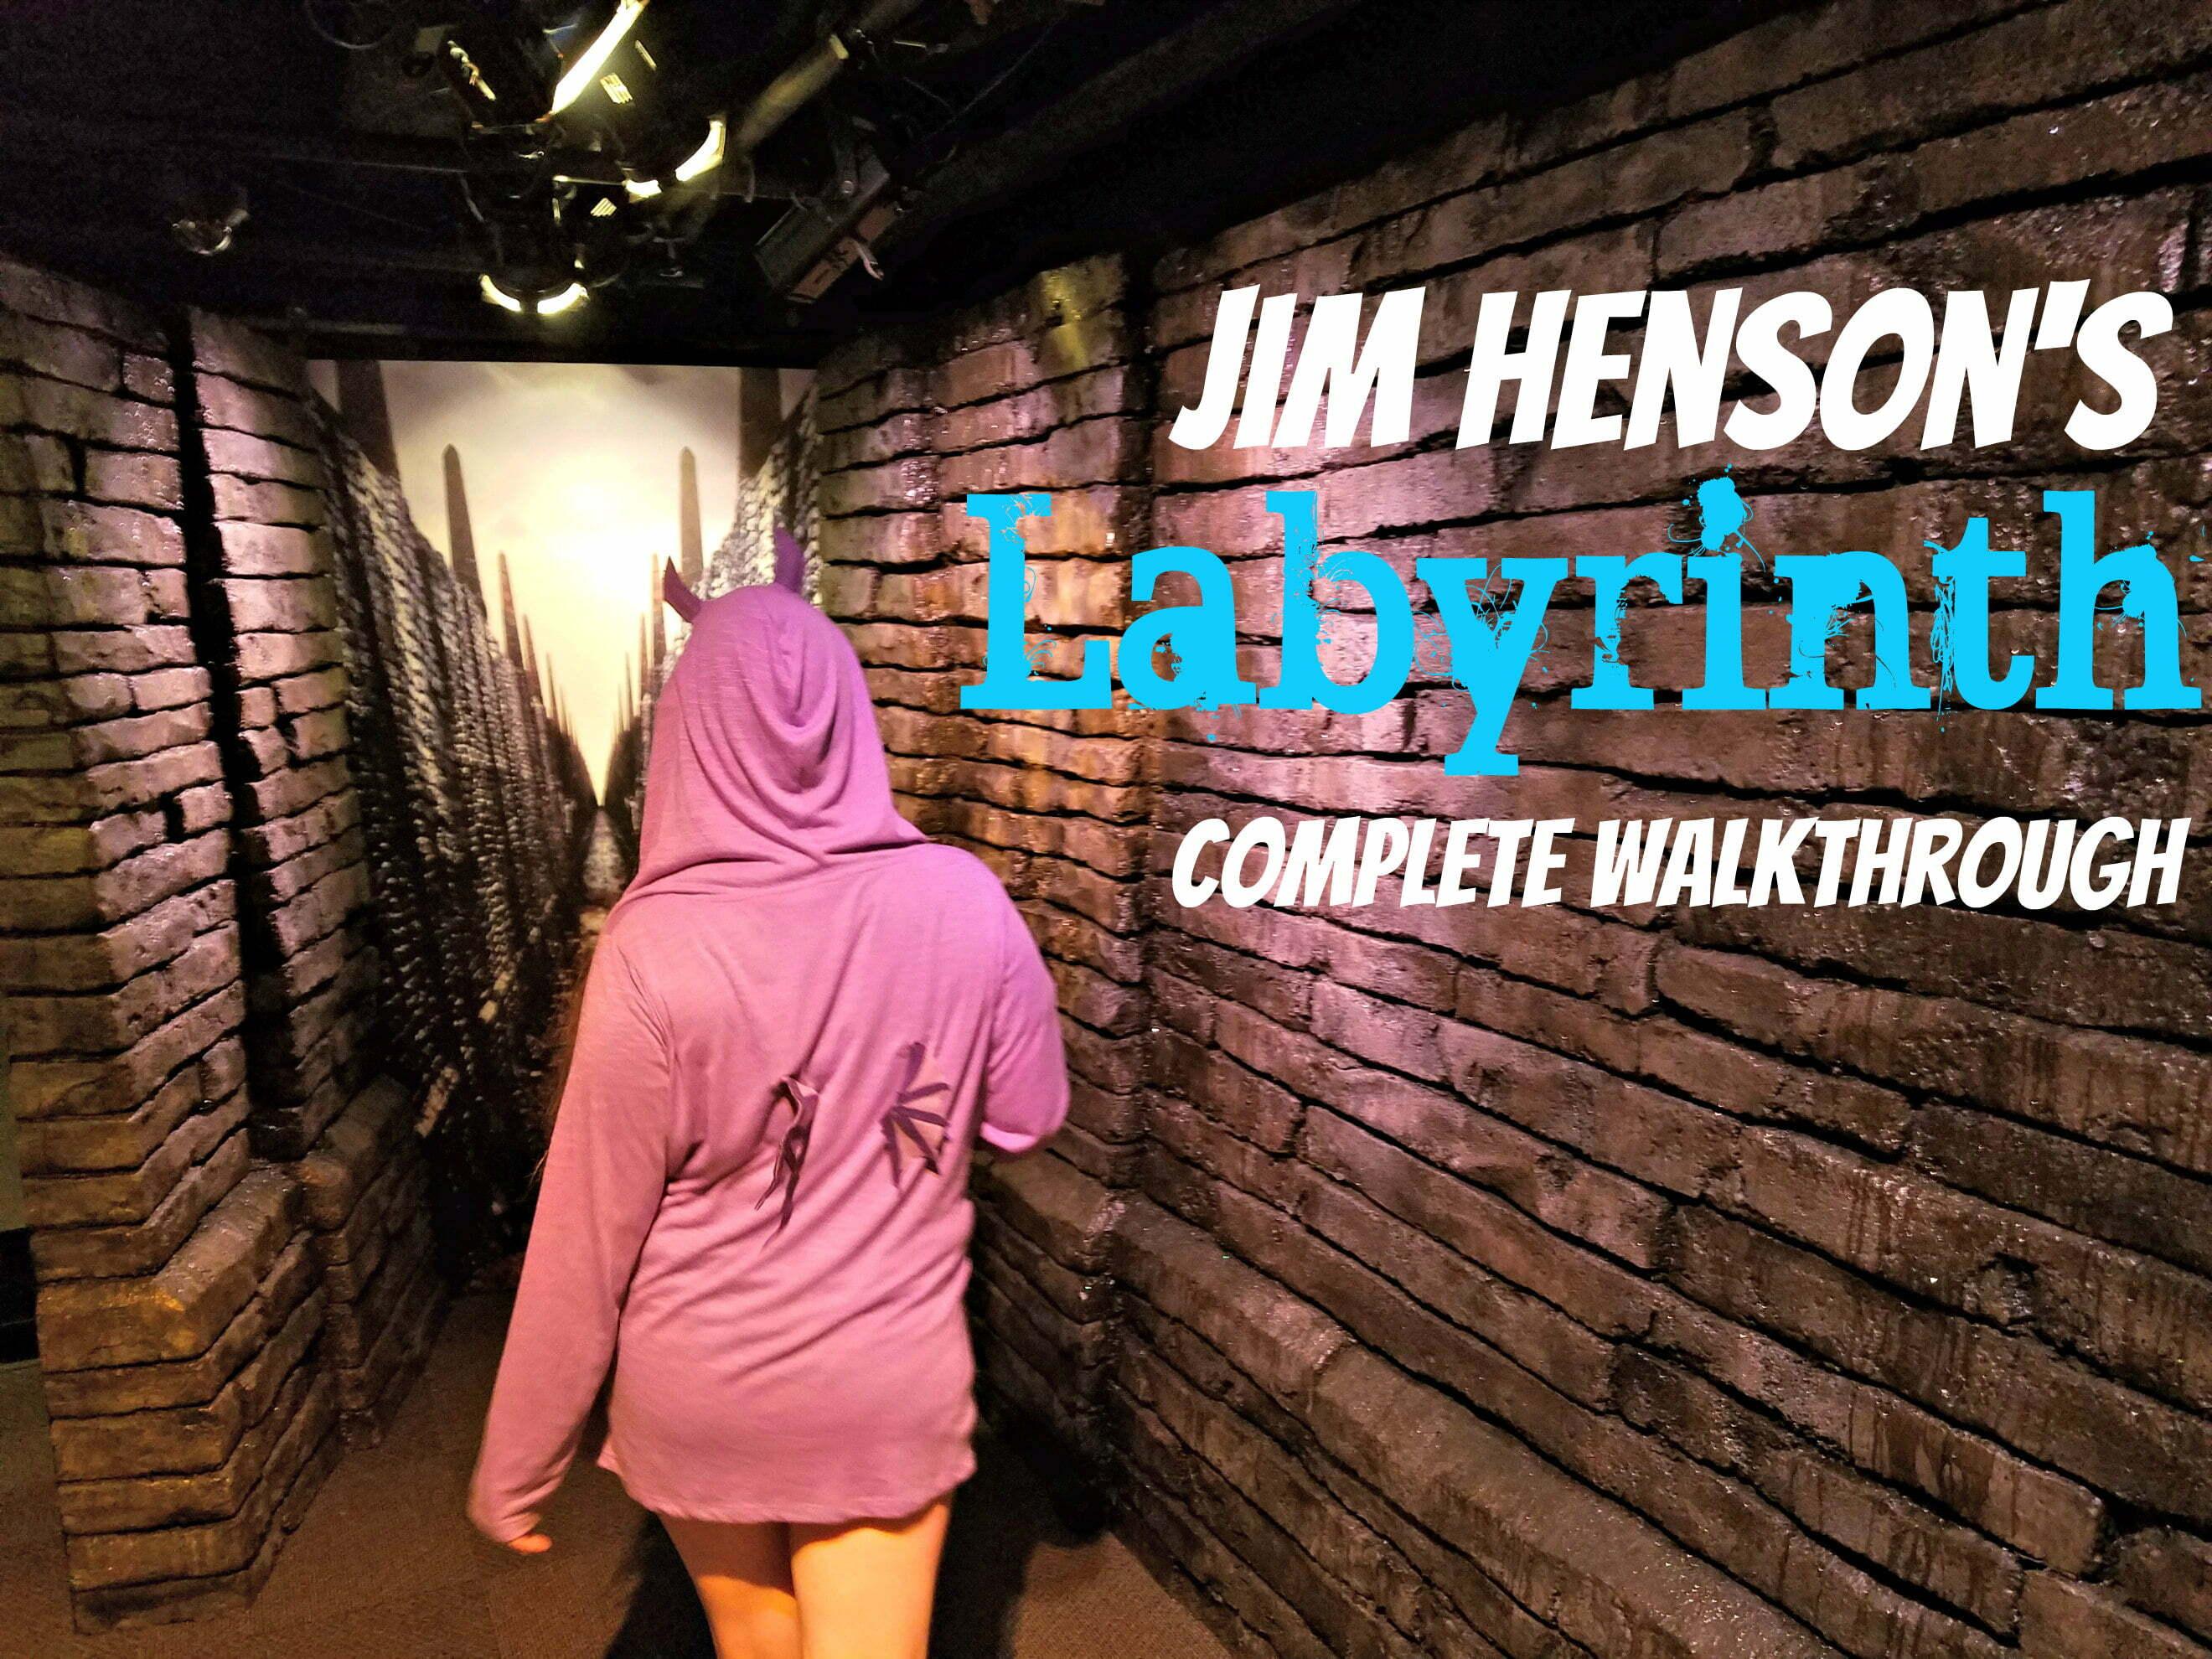 Jim Henson's Labyrinth Exhibit Feels Like Living Inside the